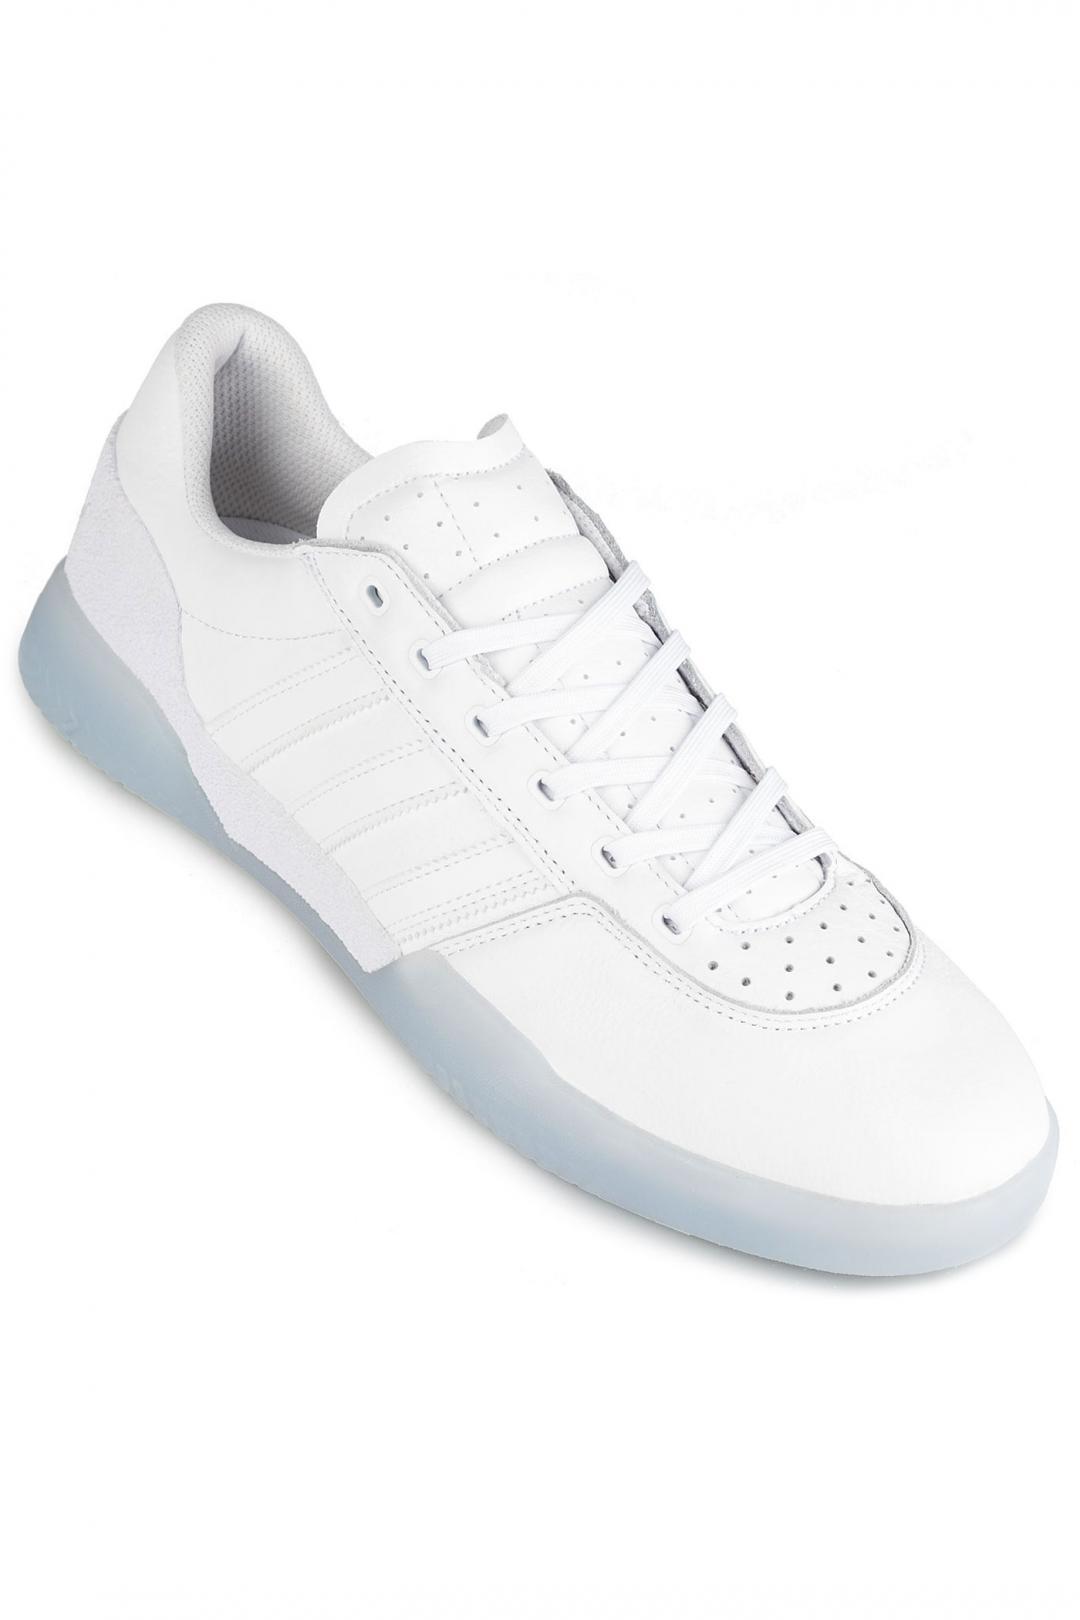 Uomo adidas Skateboarding City Cup white white gold | Scarpe da skate